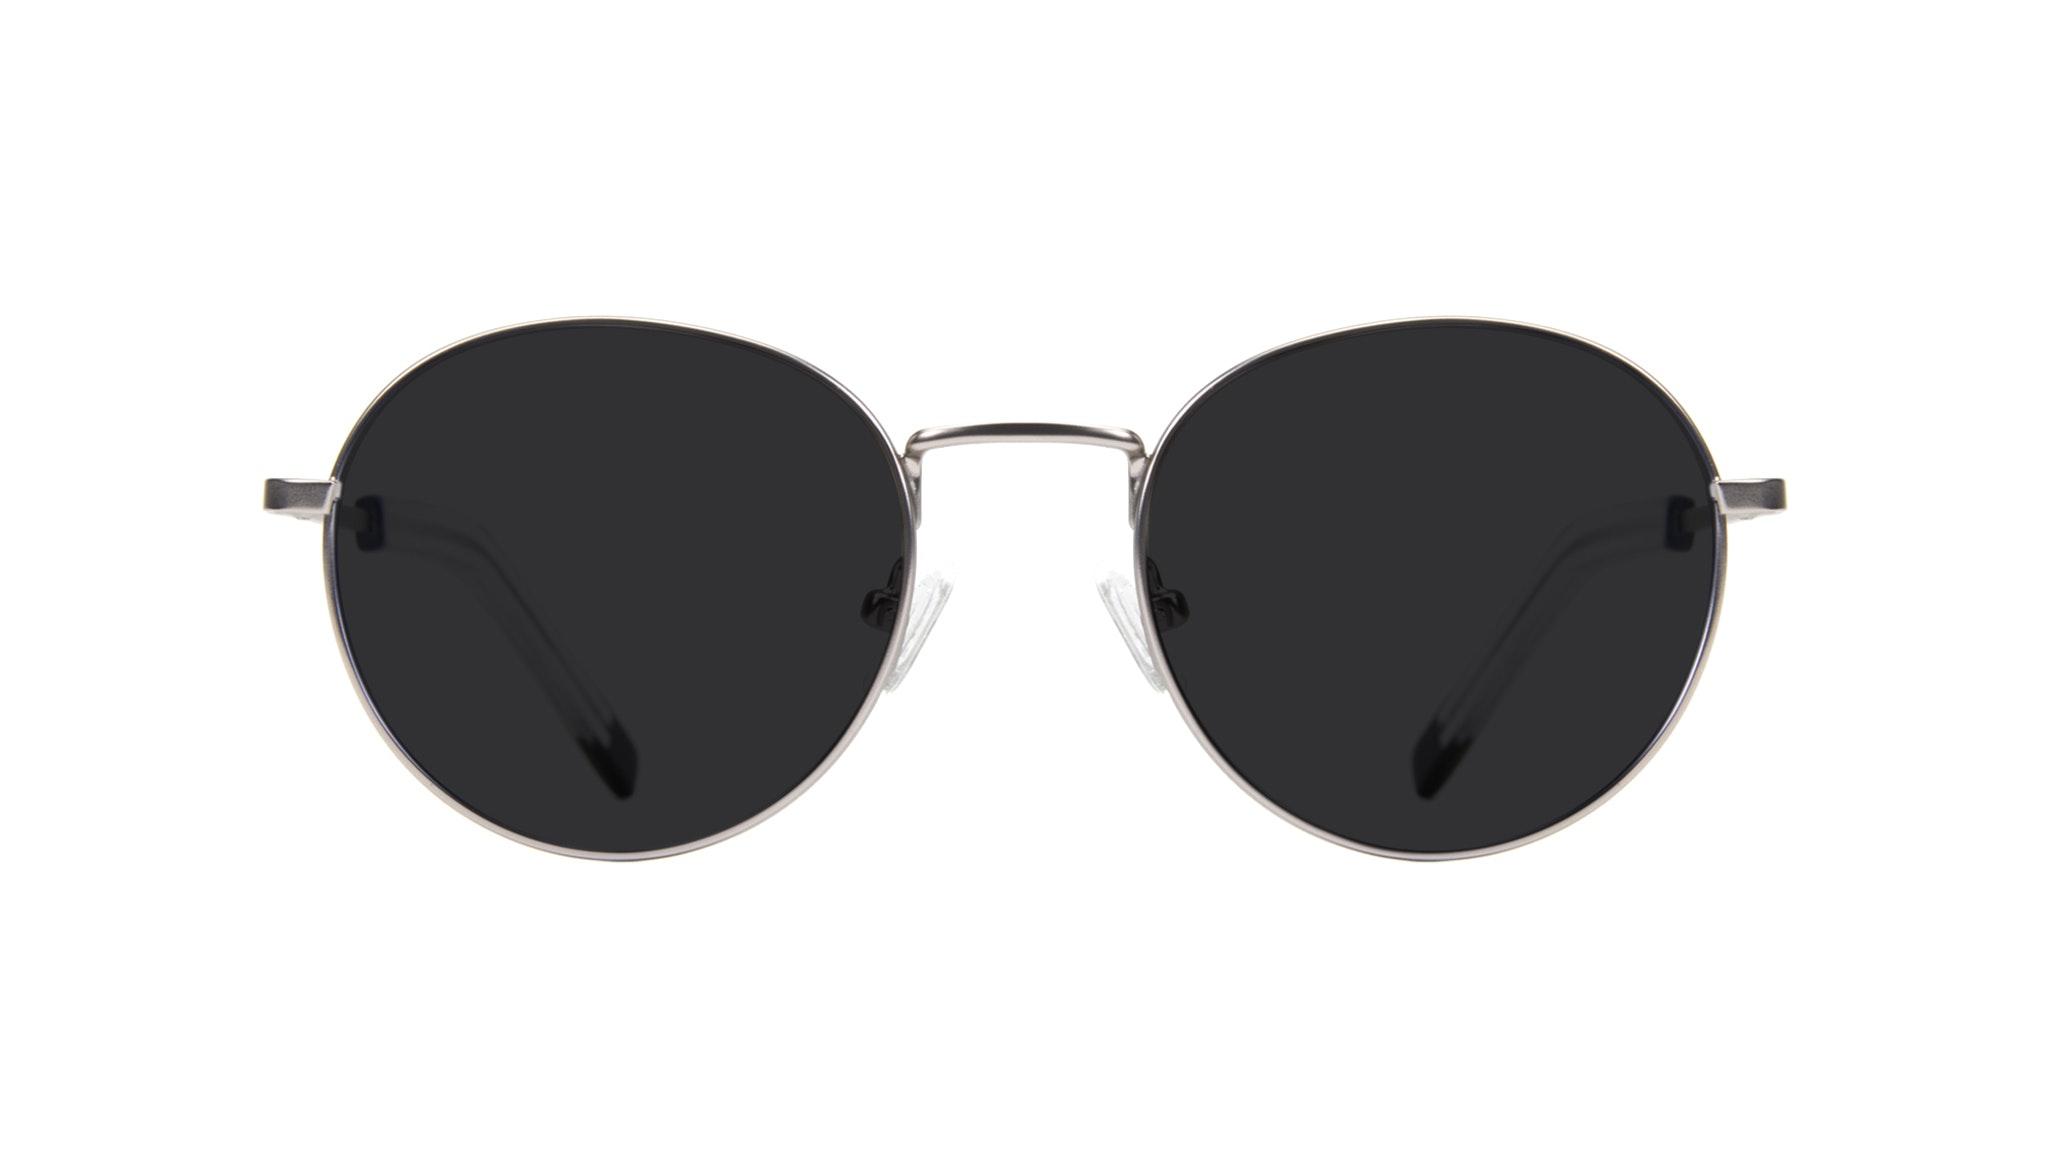 Affordable Fashion Glasses Round Sunglasses Men Lean Steel